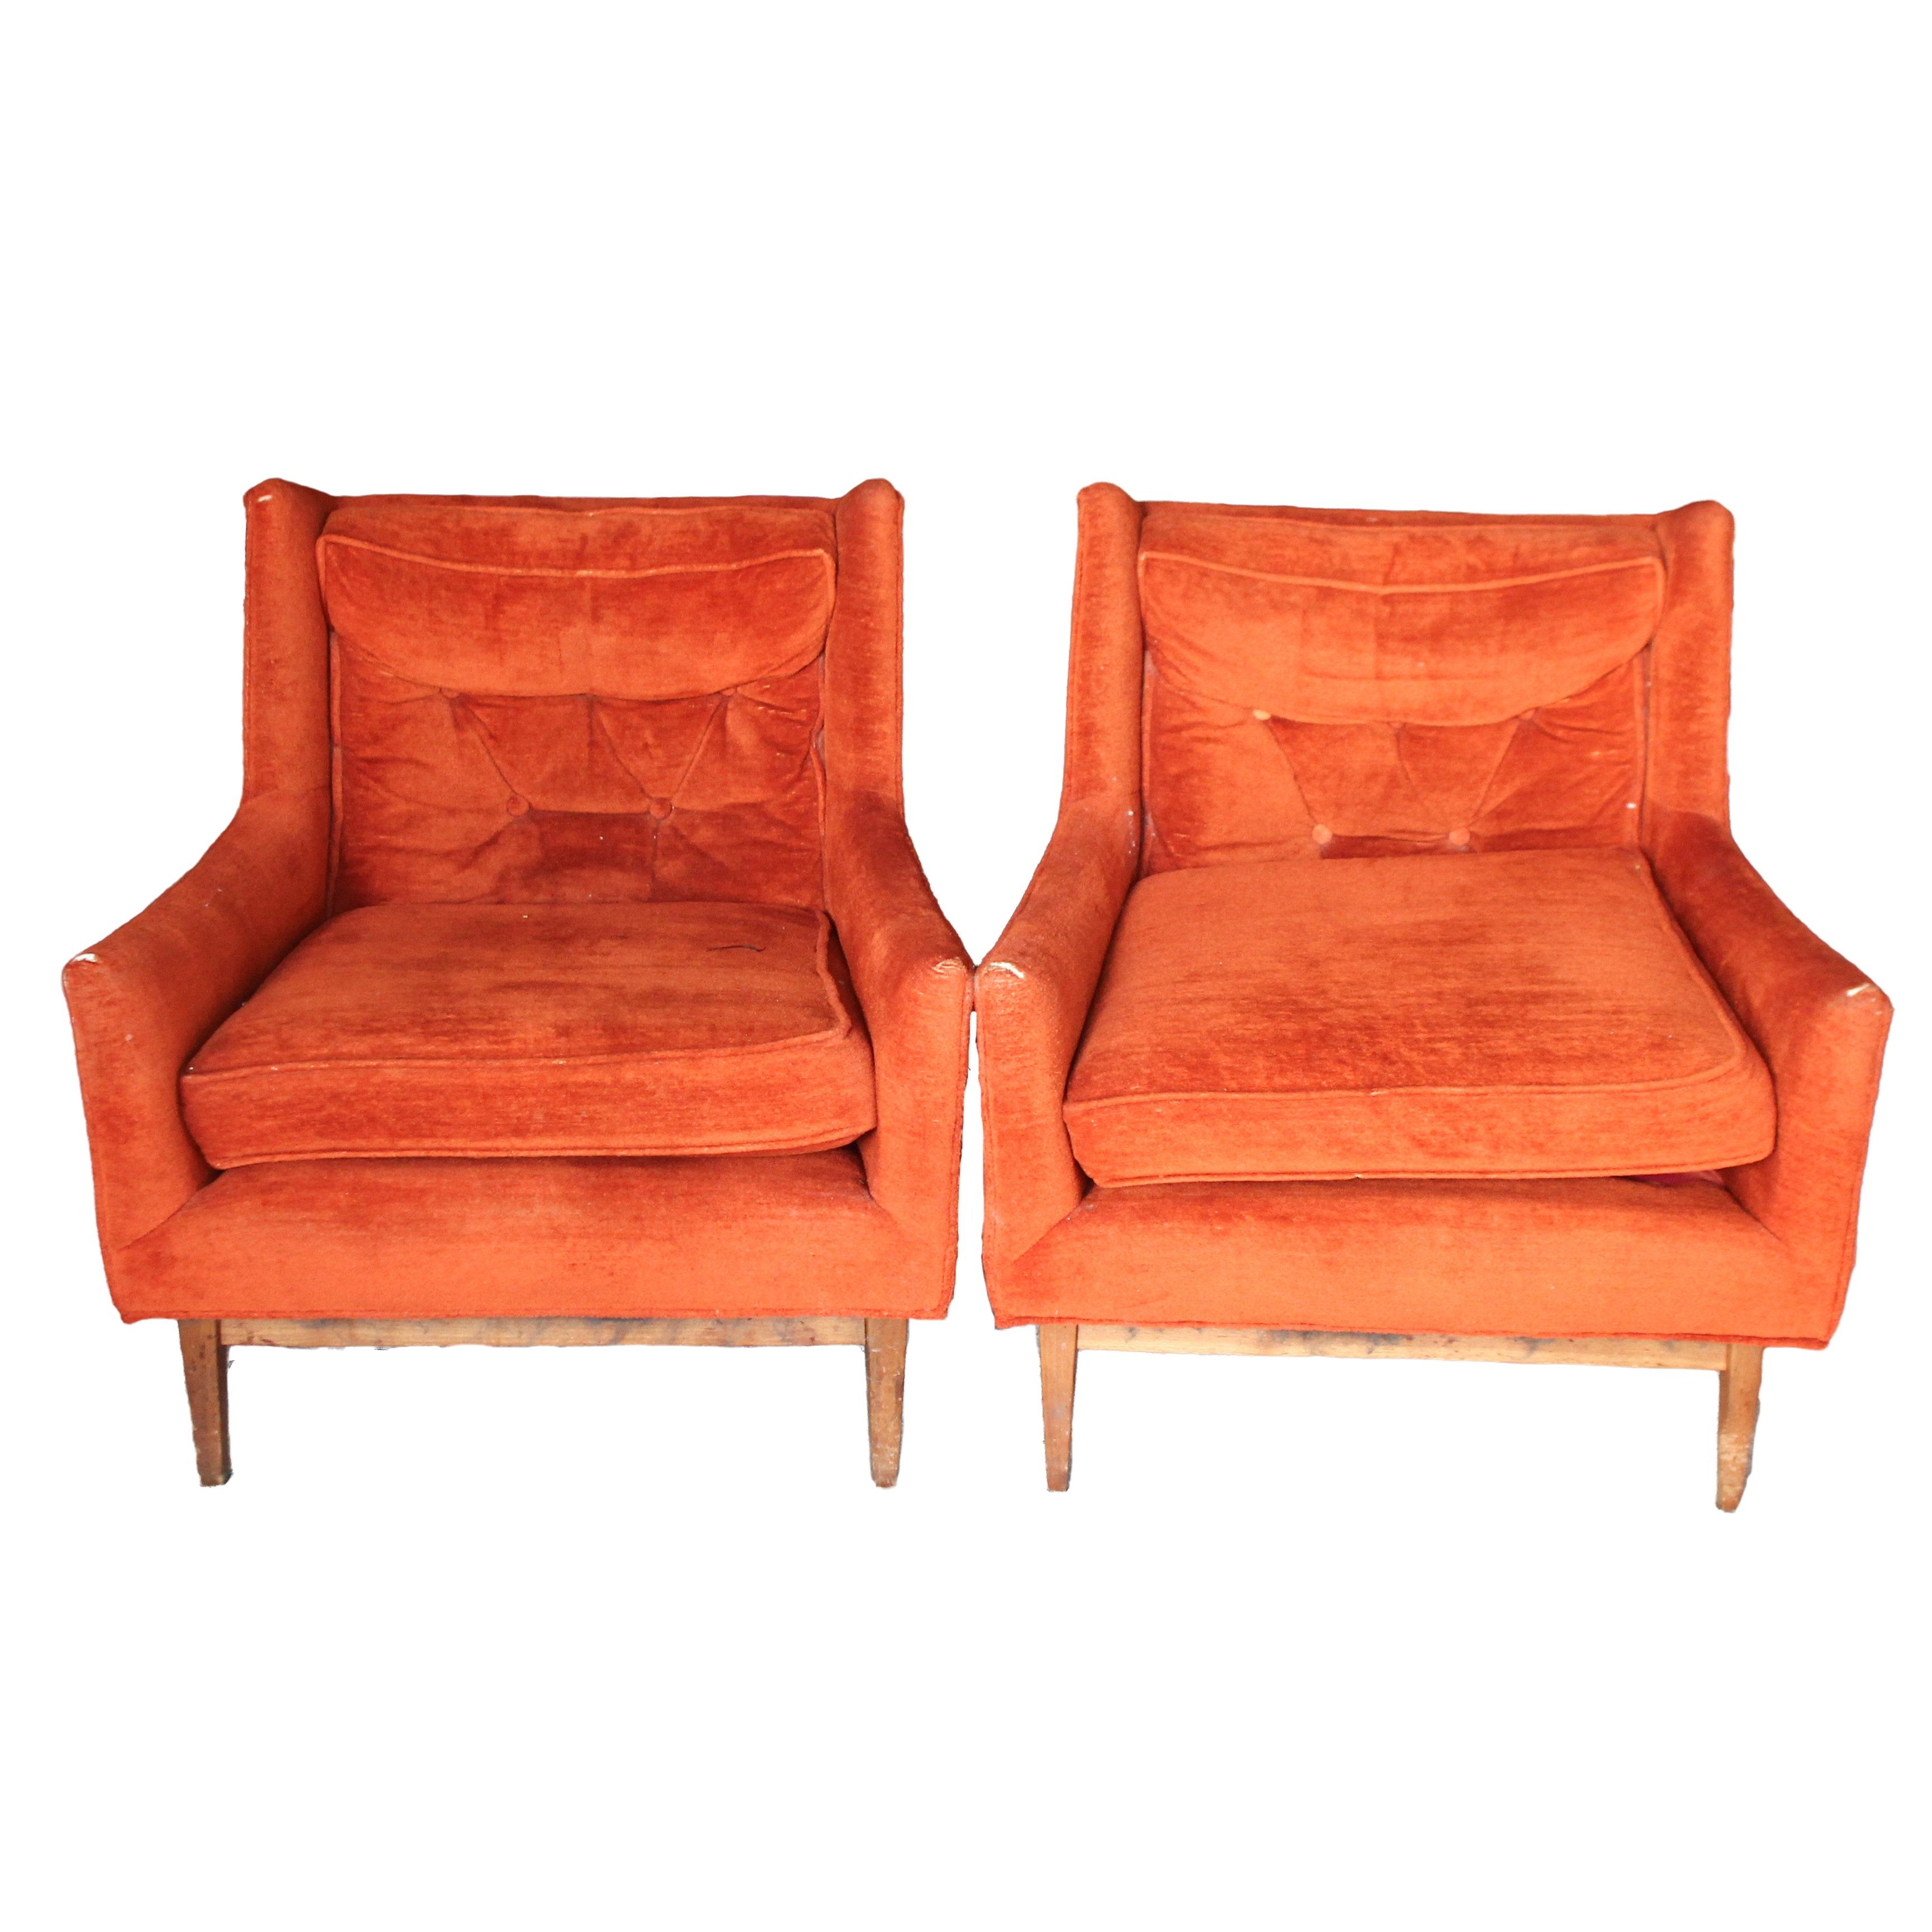 Vintage Mid Century Modern Orange Upholstered Wingback Chairs